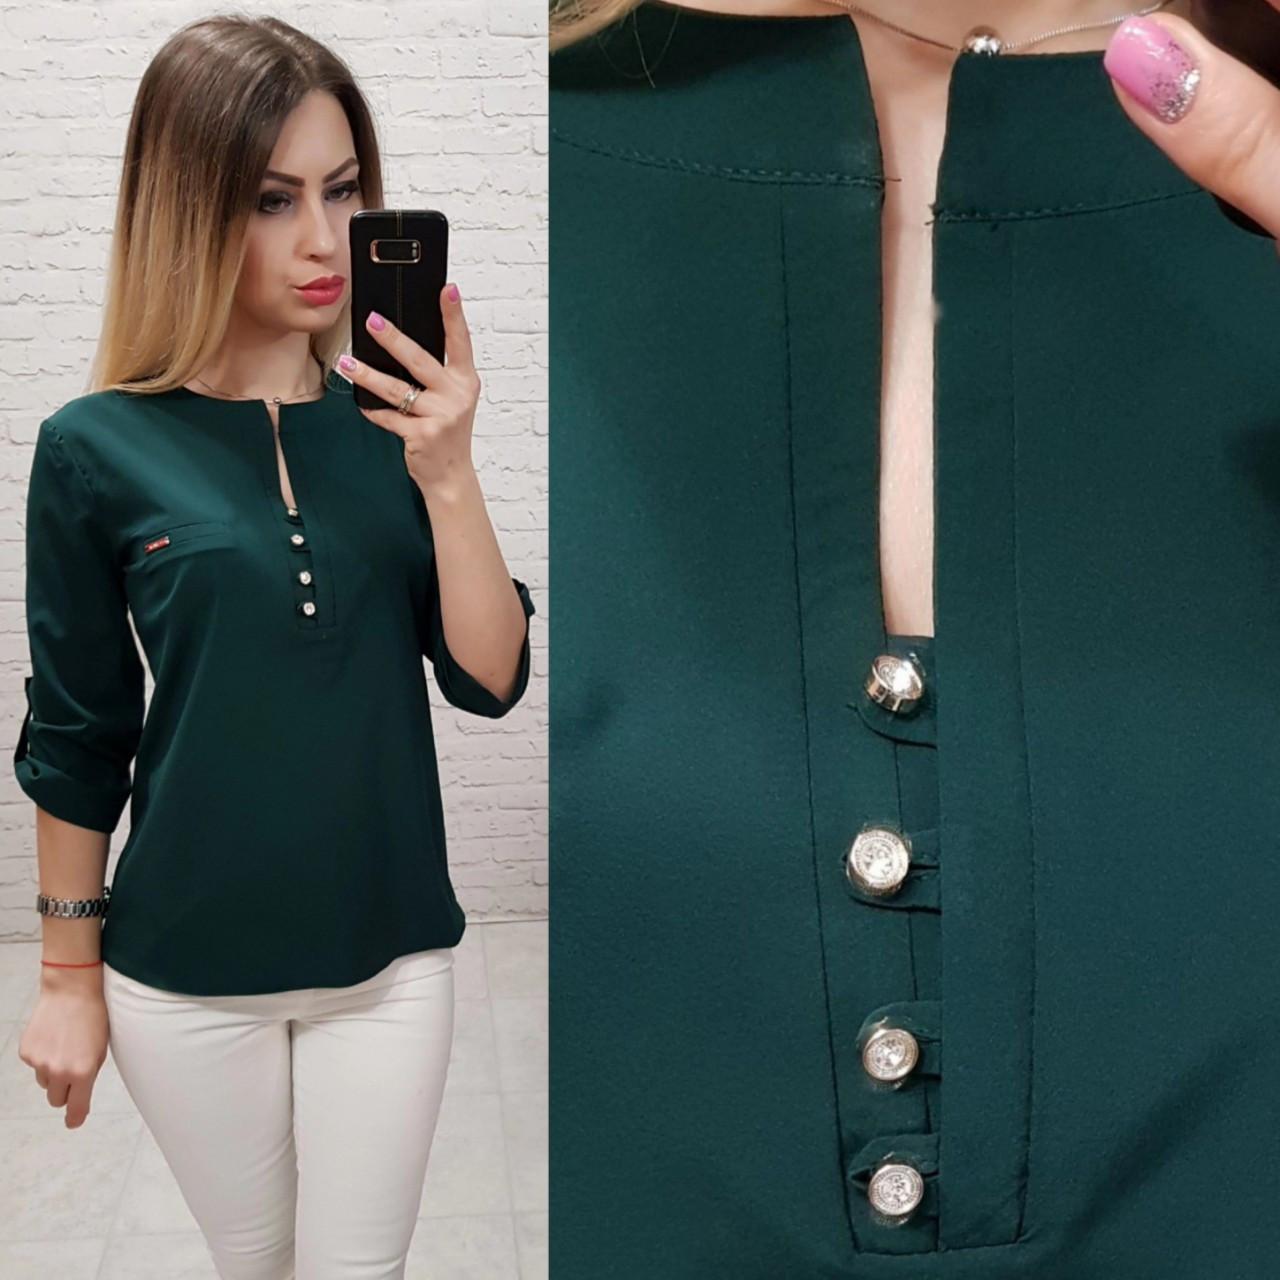 Блуза / блузка арт. 830 зелёного цвета  /  темно - зелёный бутылочный